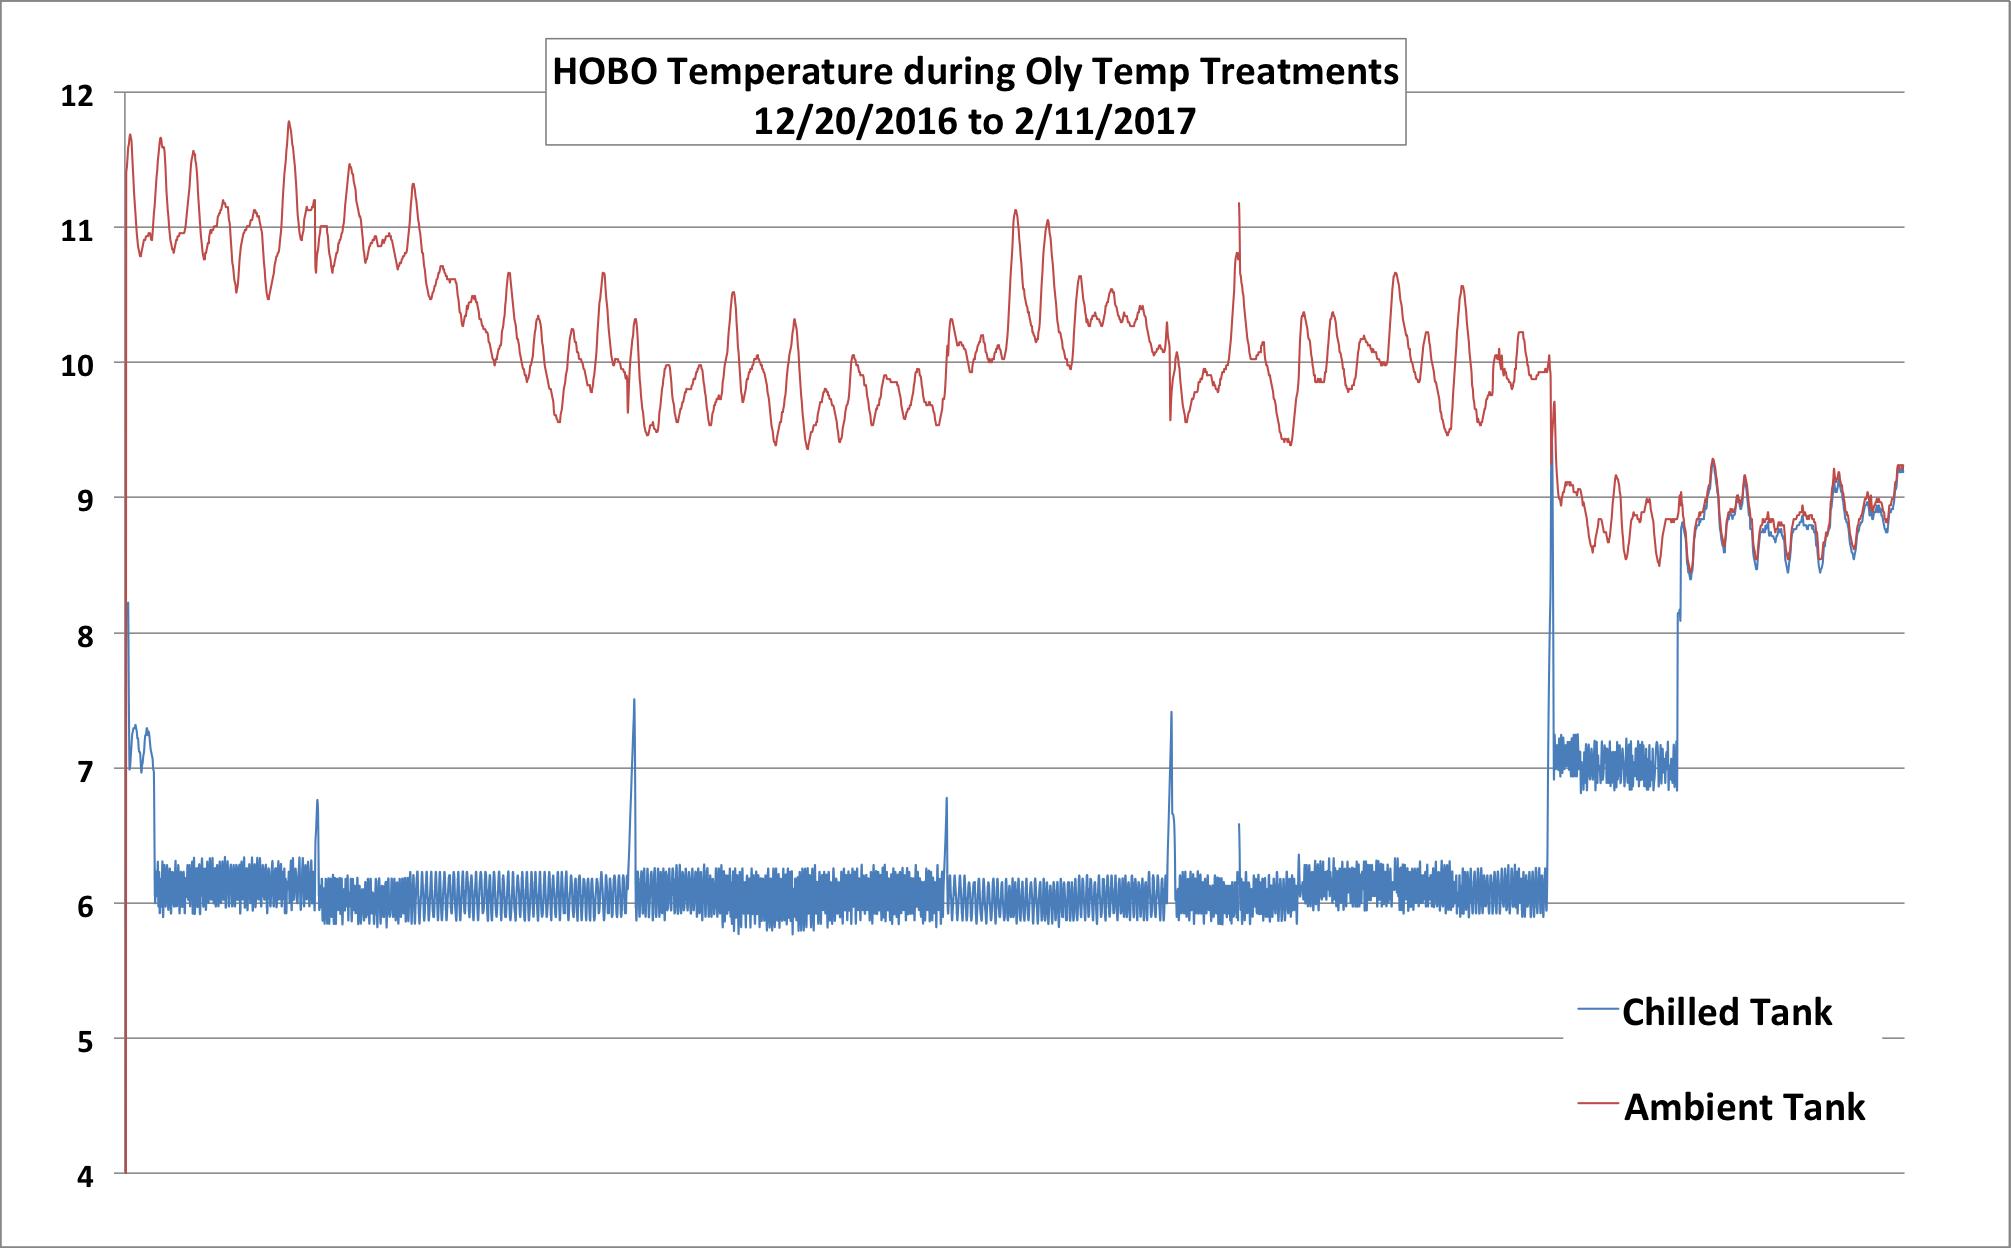 HOBO Temp data during temp treatments